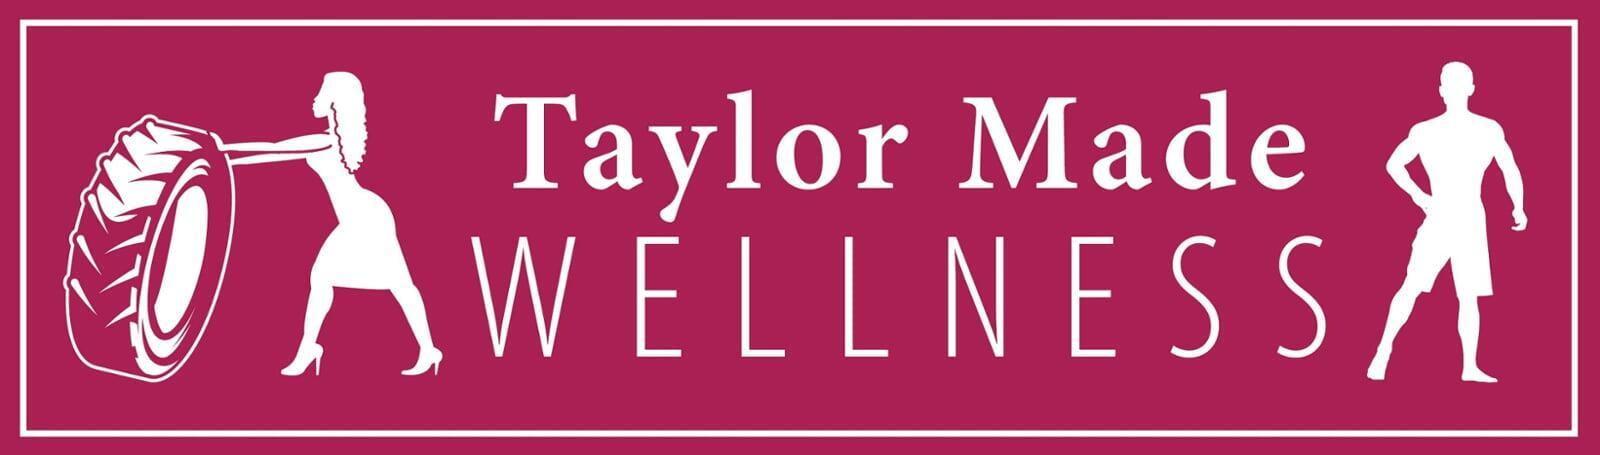 Taylor Made Wellness